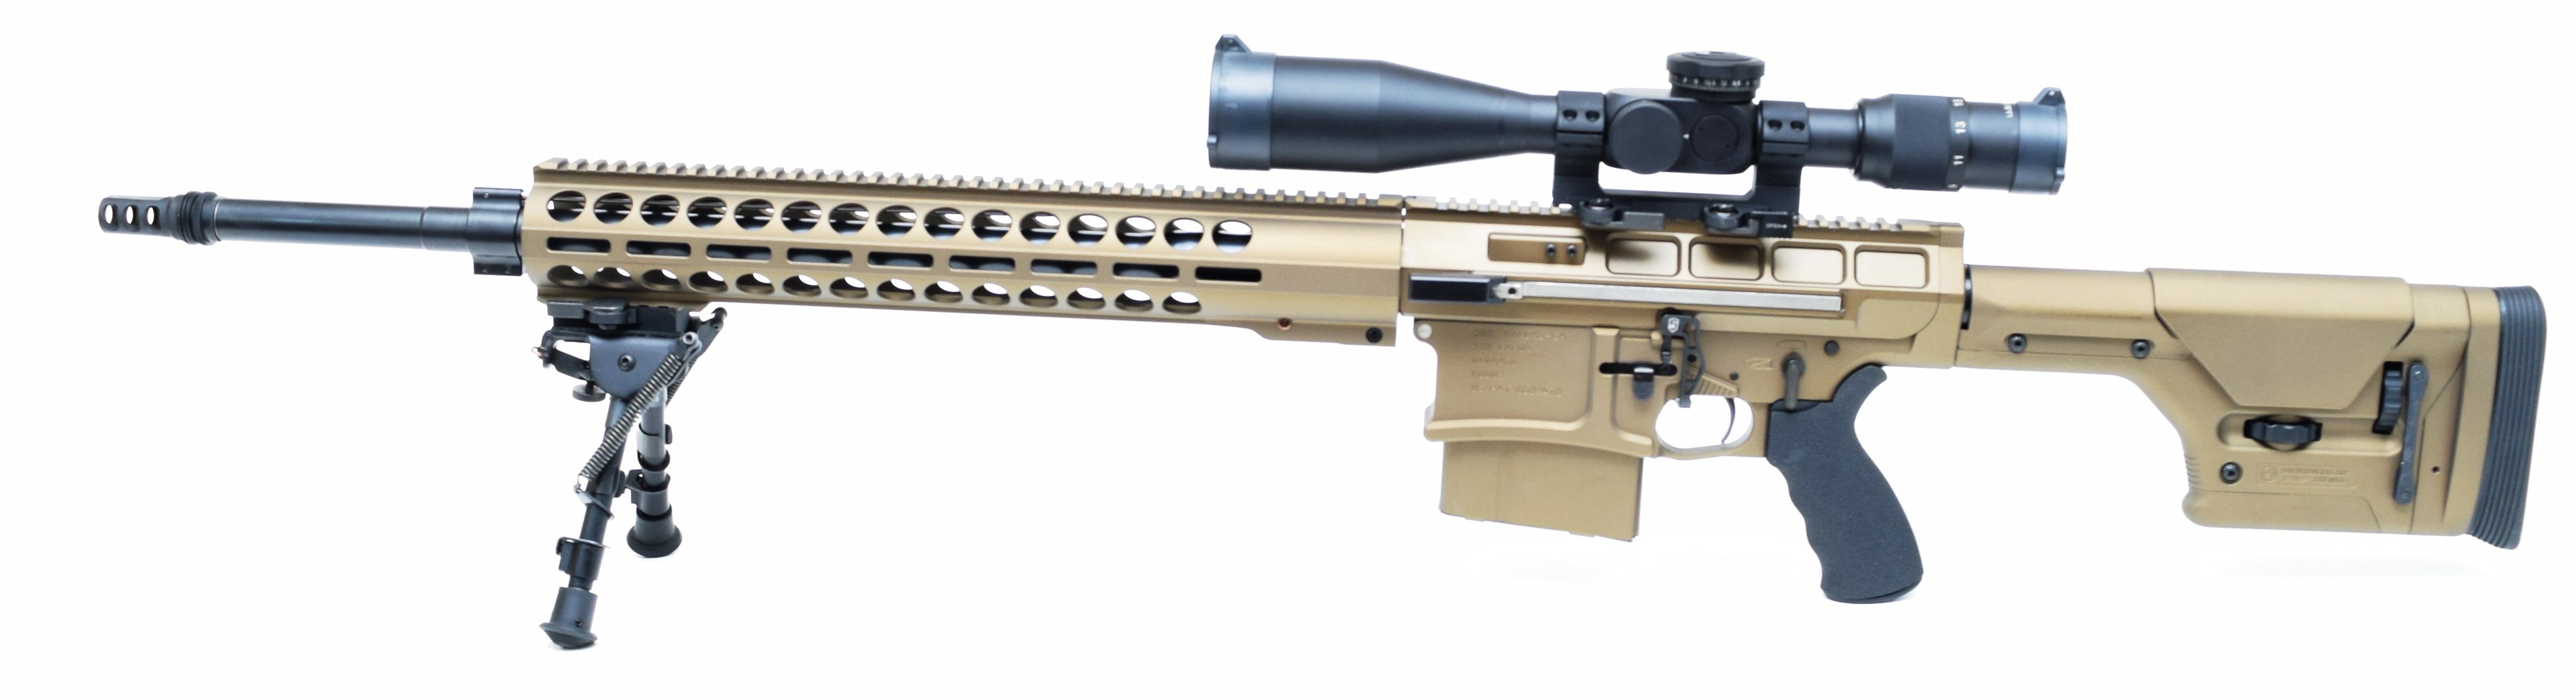 HQ Lapua .338 Sniper Rifle Wallpapers   File 833.75Kb